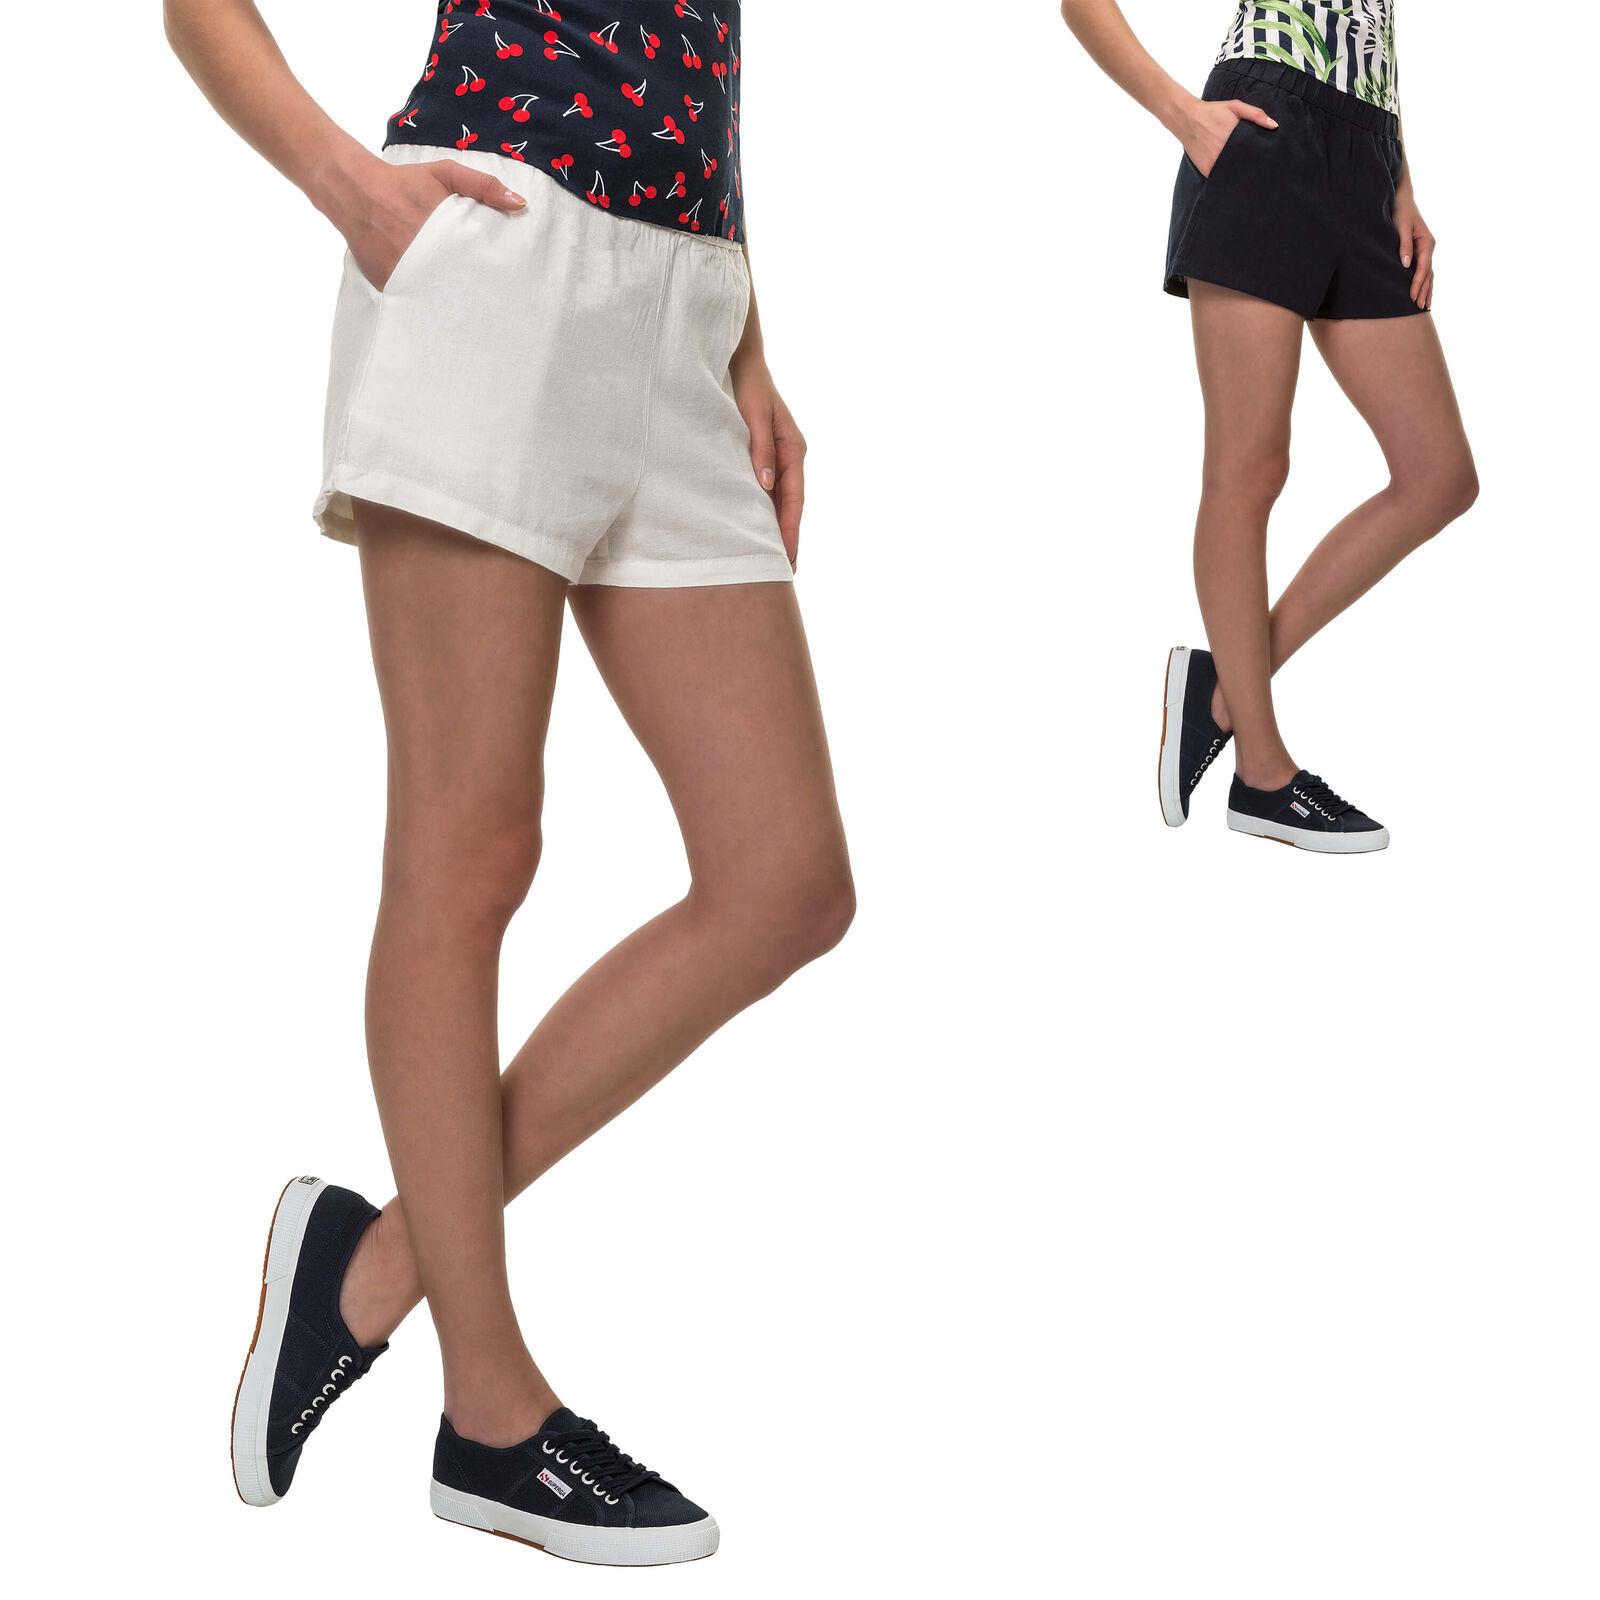 Women's Clothing Shorts Pieces Damen Shorts Radlerhose Bermudas Skinny Fit Stretch Basic Kurze Hose Neu